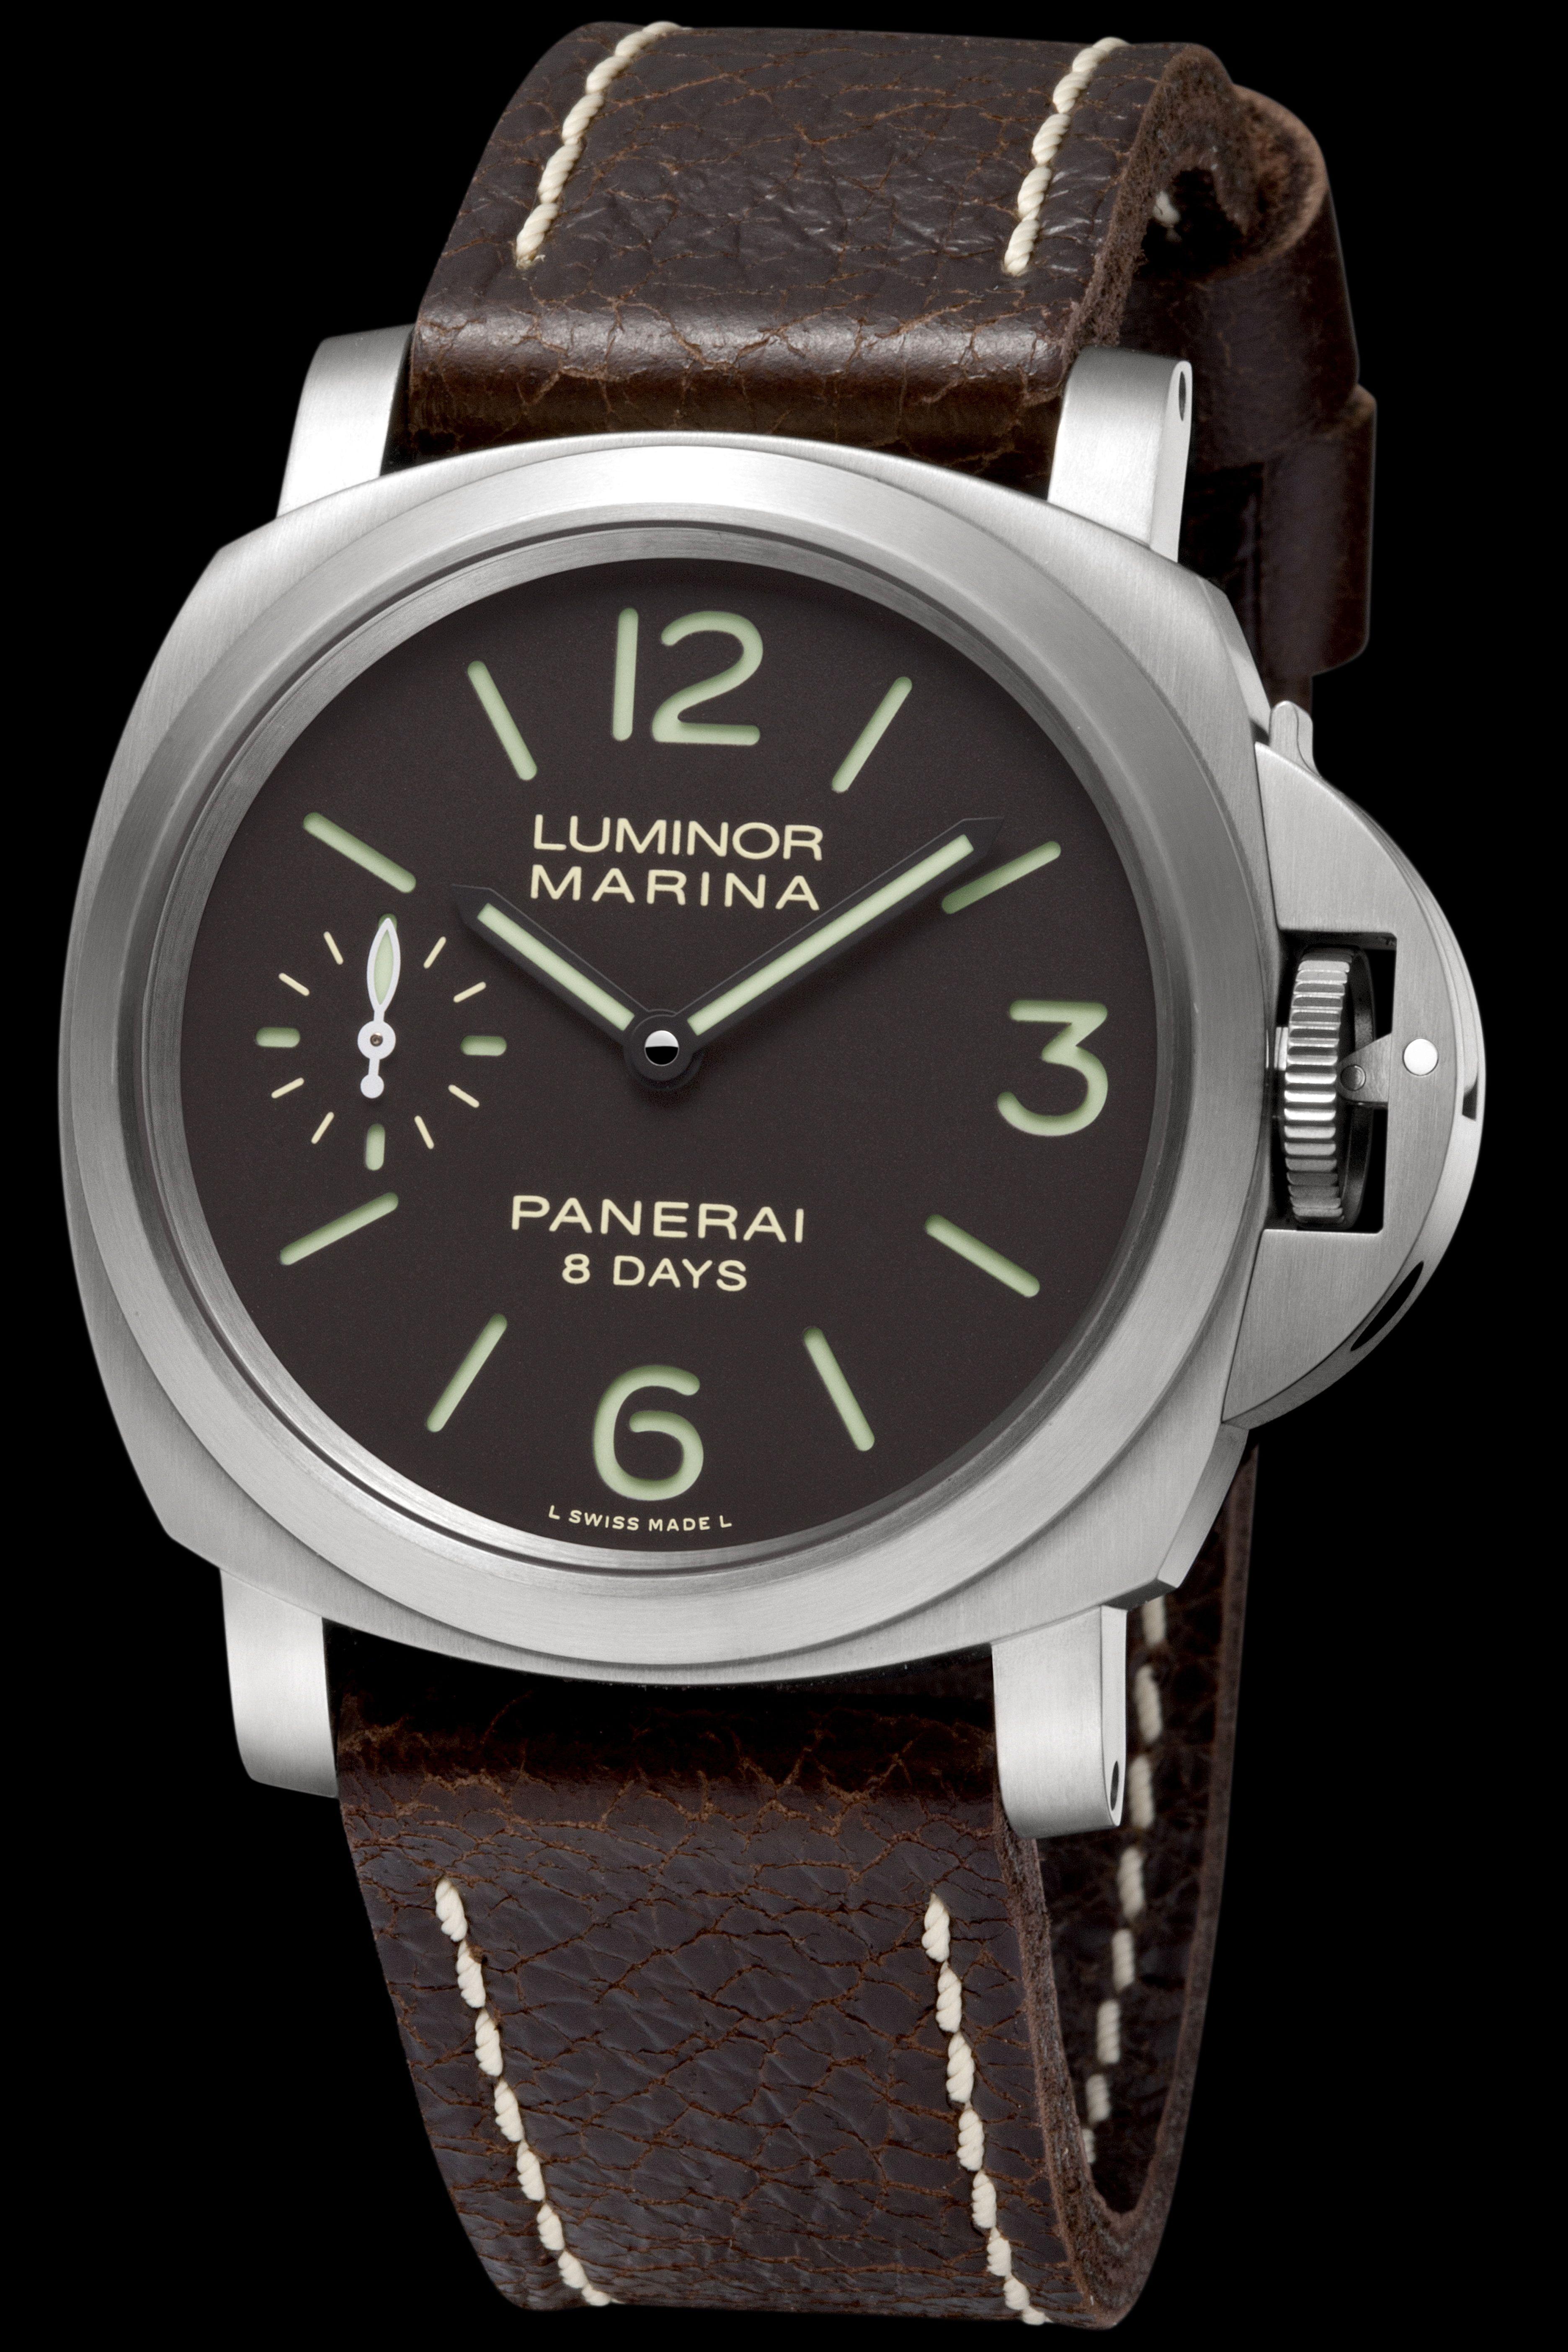 PANERAI: Luminor Marina 8 Days Titanio, REF. PAM00564 http://www.orologi.com/cataloghi-orologi/panerai-historic-luminor-marina-8-days-titanio-pam00564